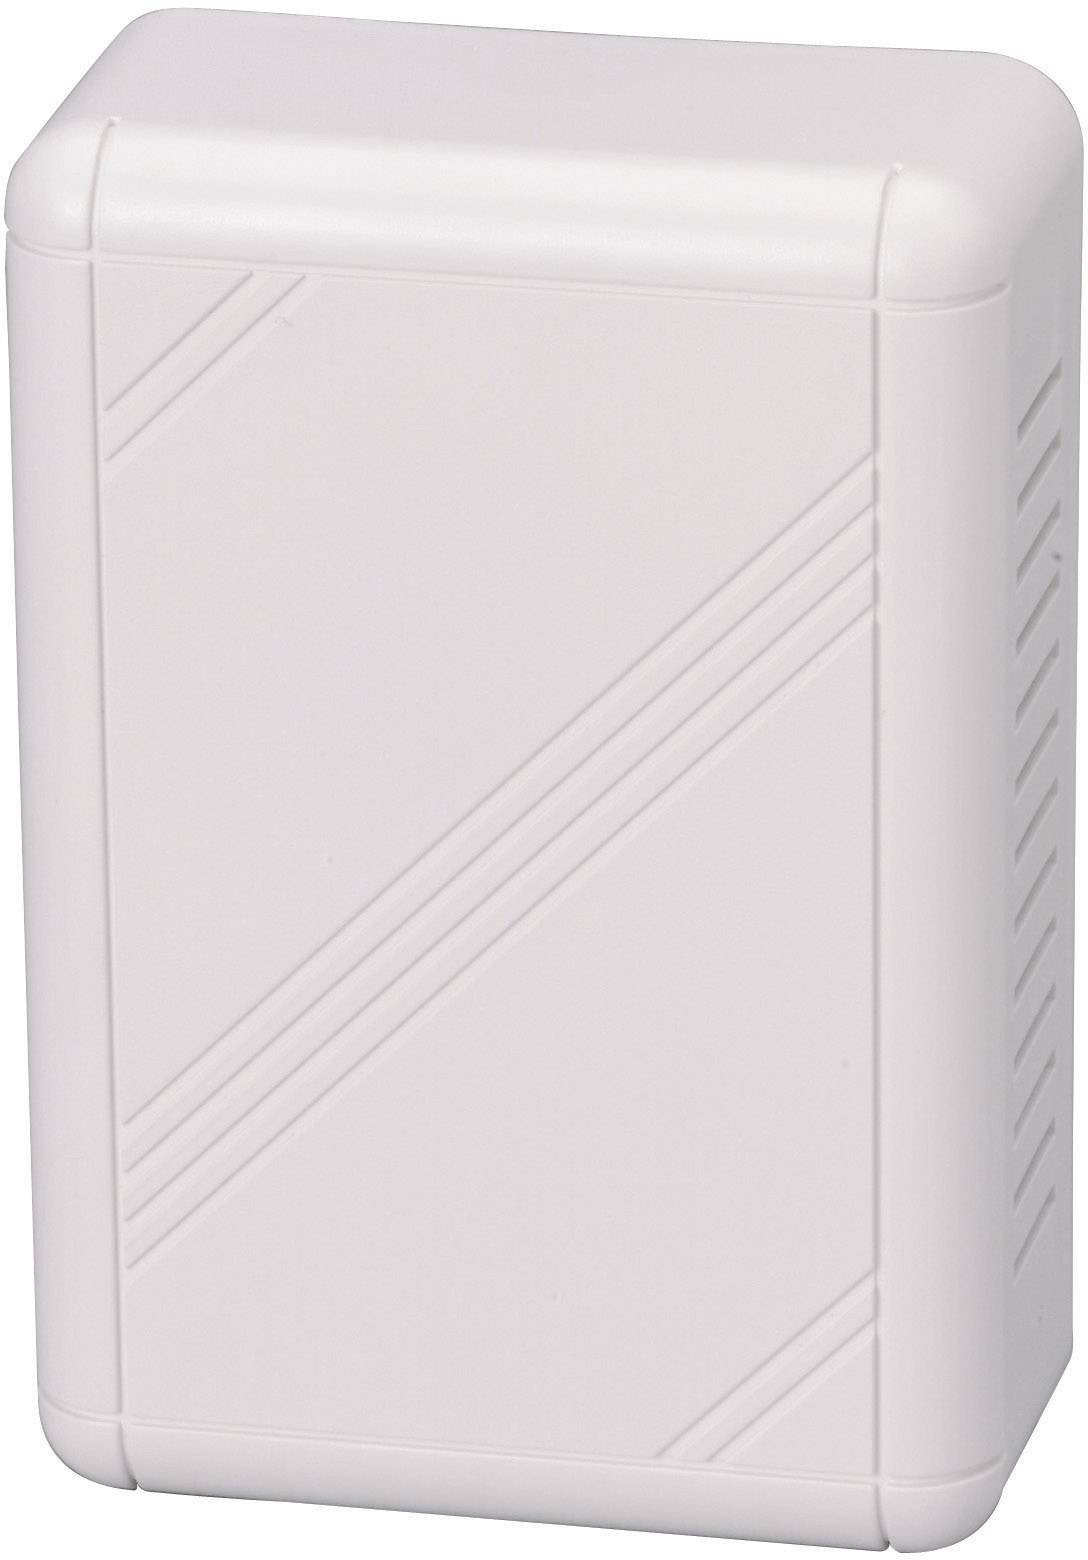 Gong Heidemann 70000 70000, 8 V (max), 82 dB (A), biela